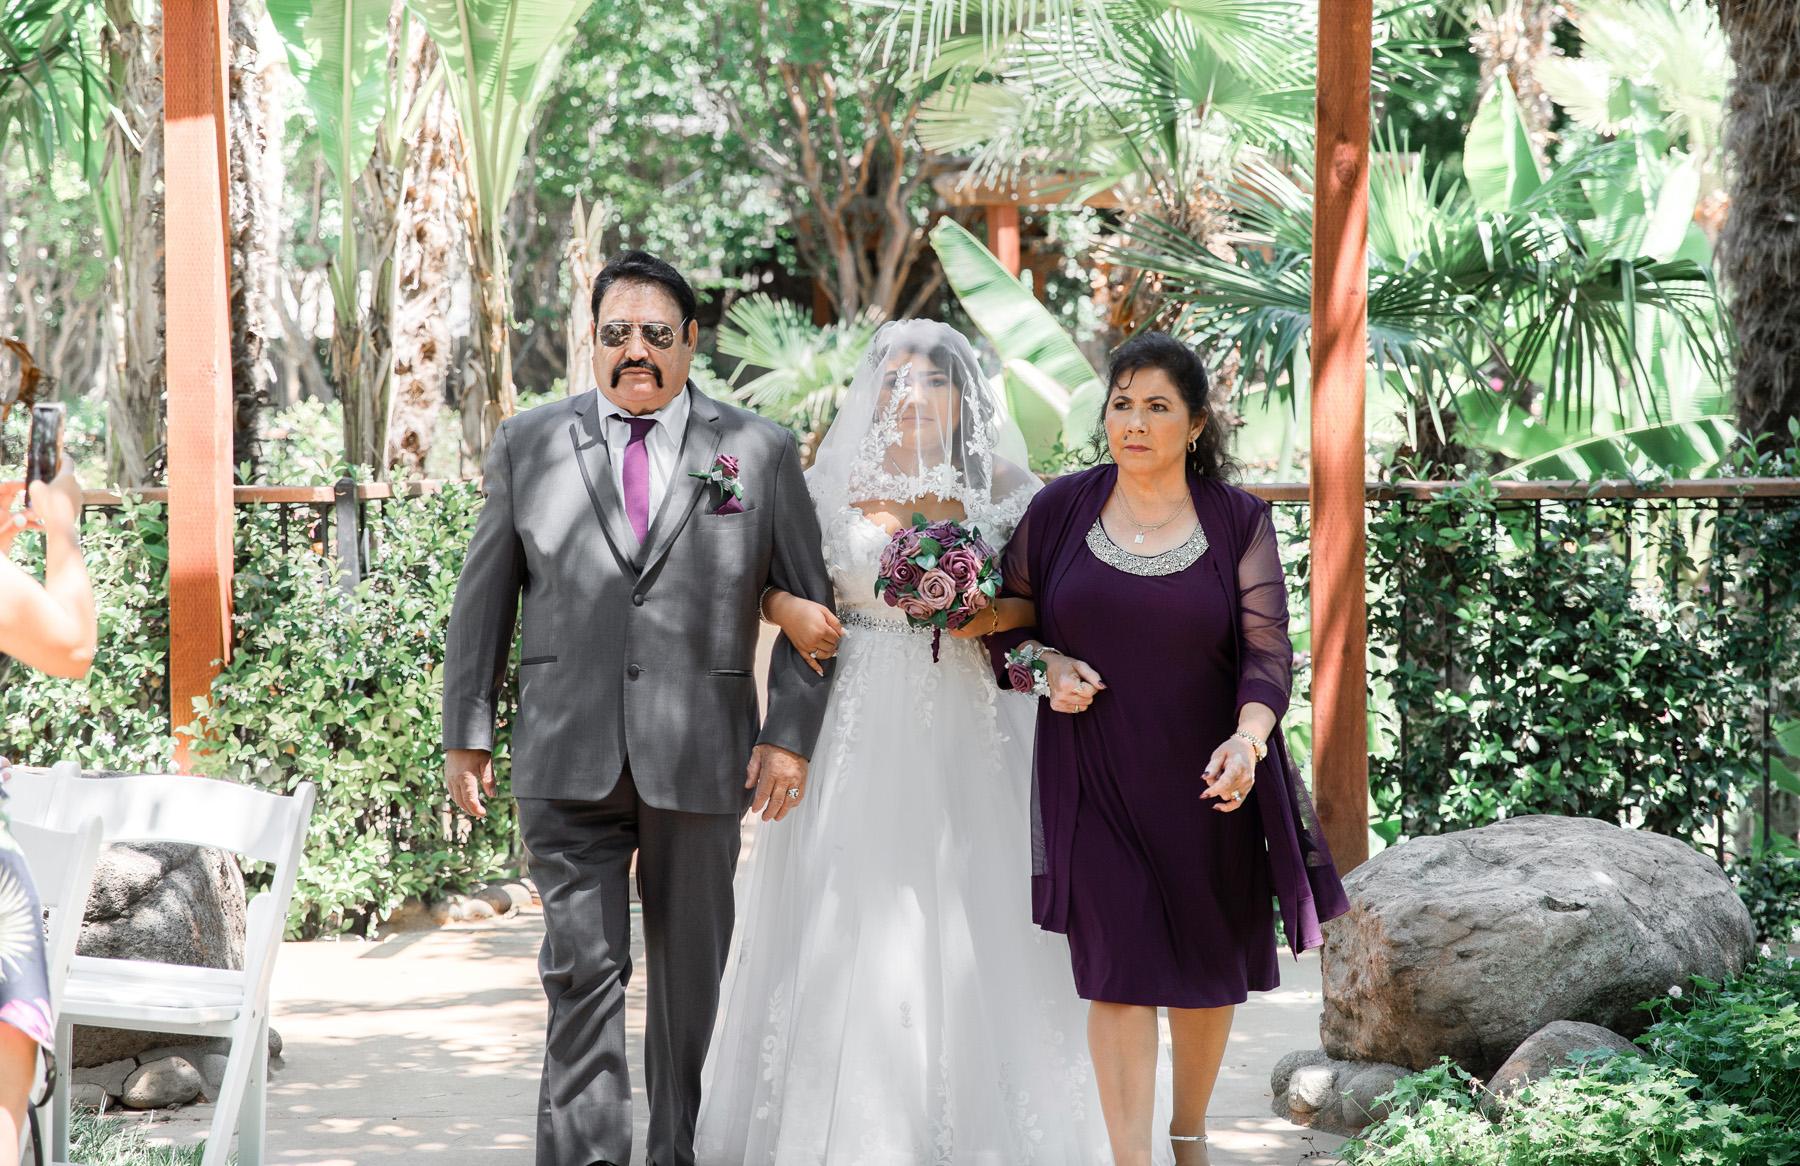 The Palms Hotel Chico Wedding Photos_17.jpg